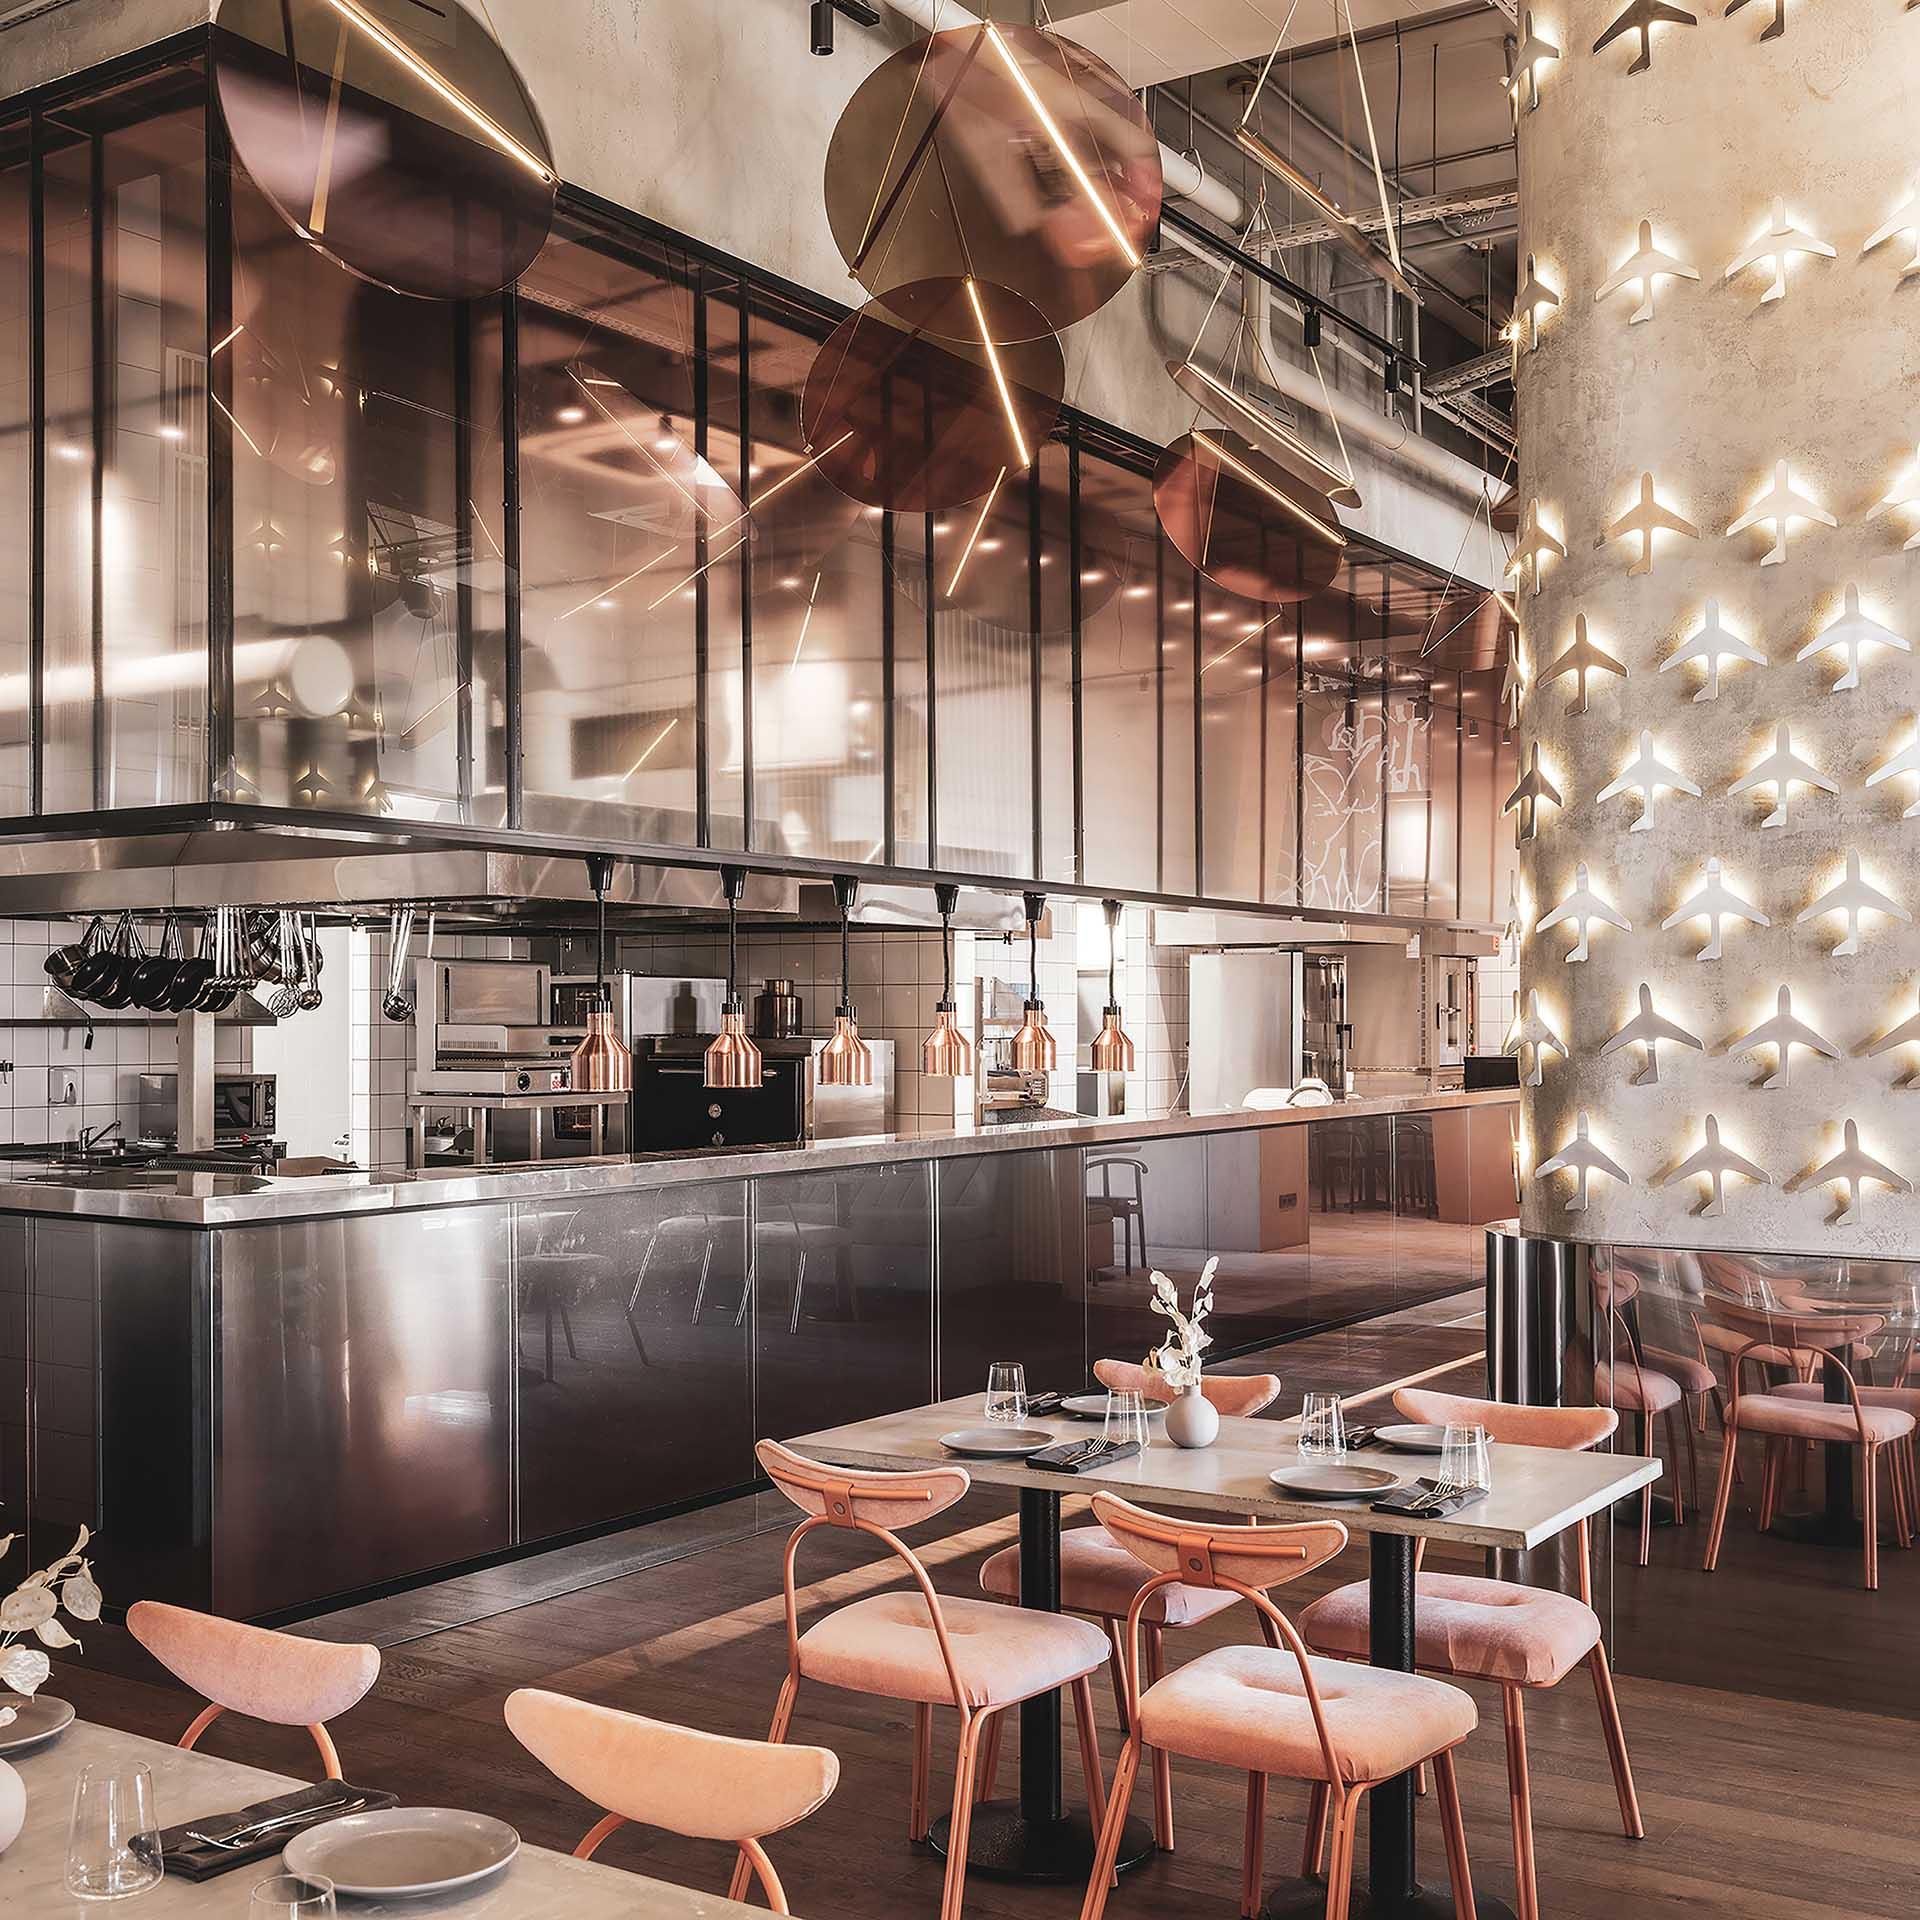 Polyot Restaurant by Julien Albertini and Alina Pimkina.